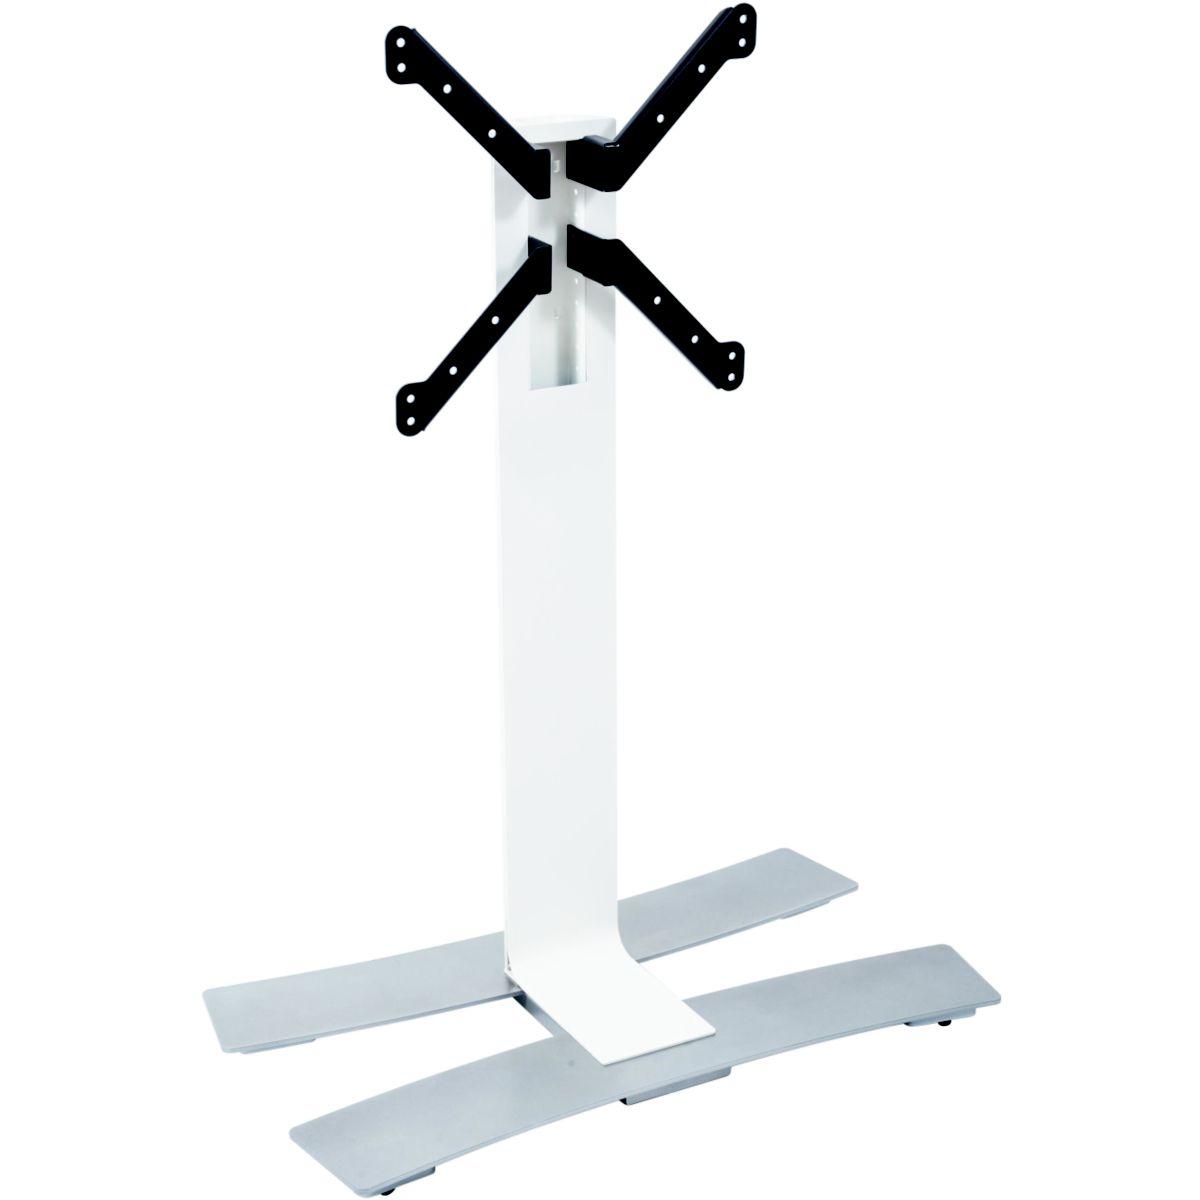 Meuble tv erard will 1050l 30-55p blanc+tabl & roues - 20%...